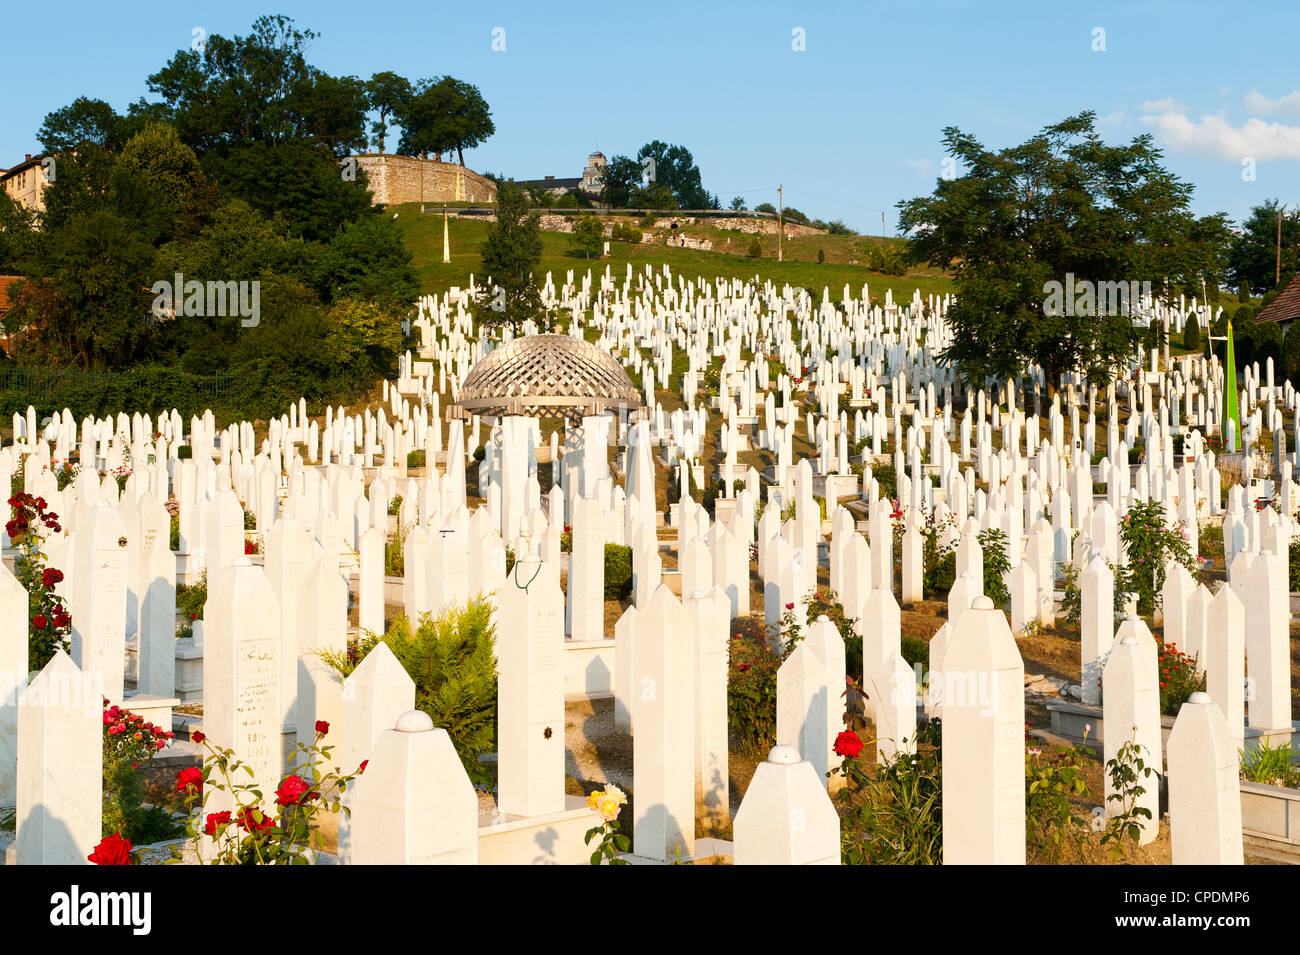 Kovaci War Cemetery, Alija Izetbegovic, Sarajevo, Bosnia and Herzegovina - Stock Image